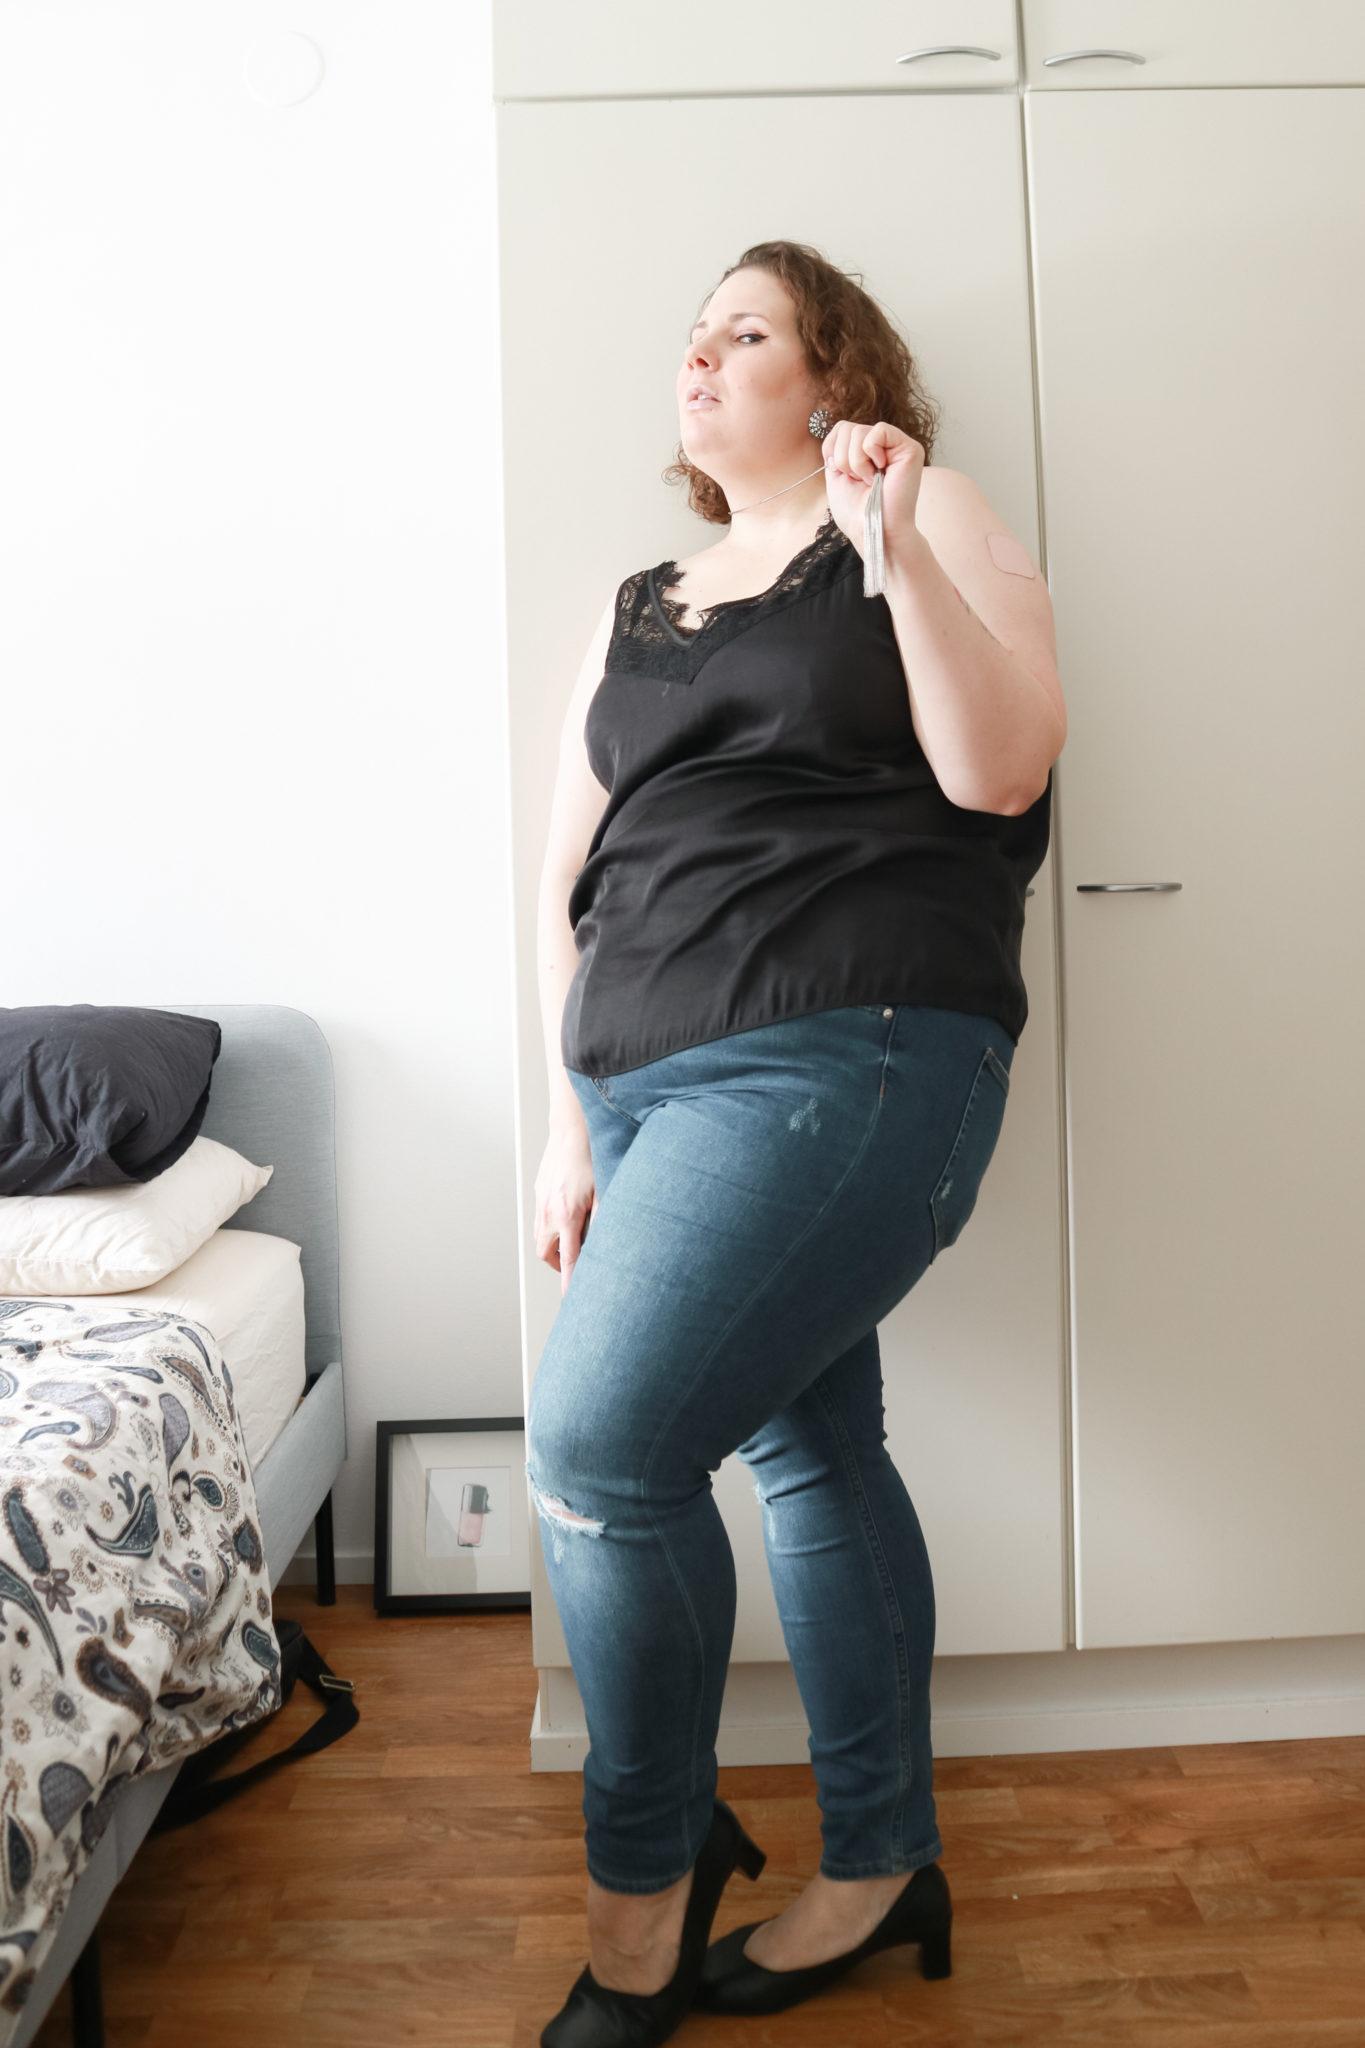 Tinder - BMH - Big mamas home by Jenni